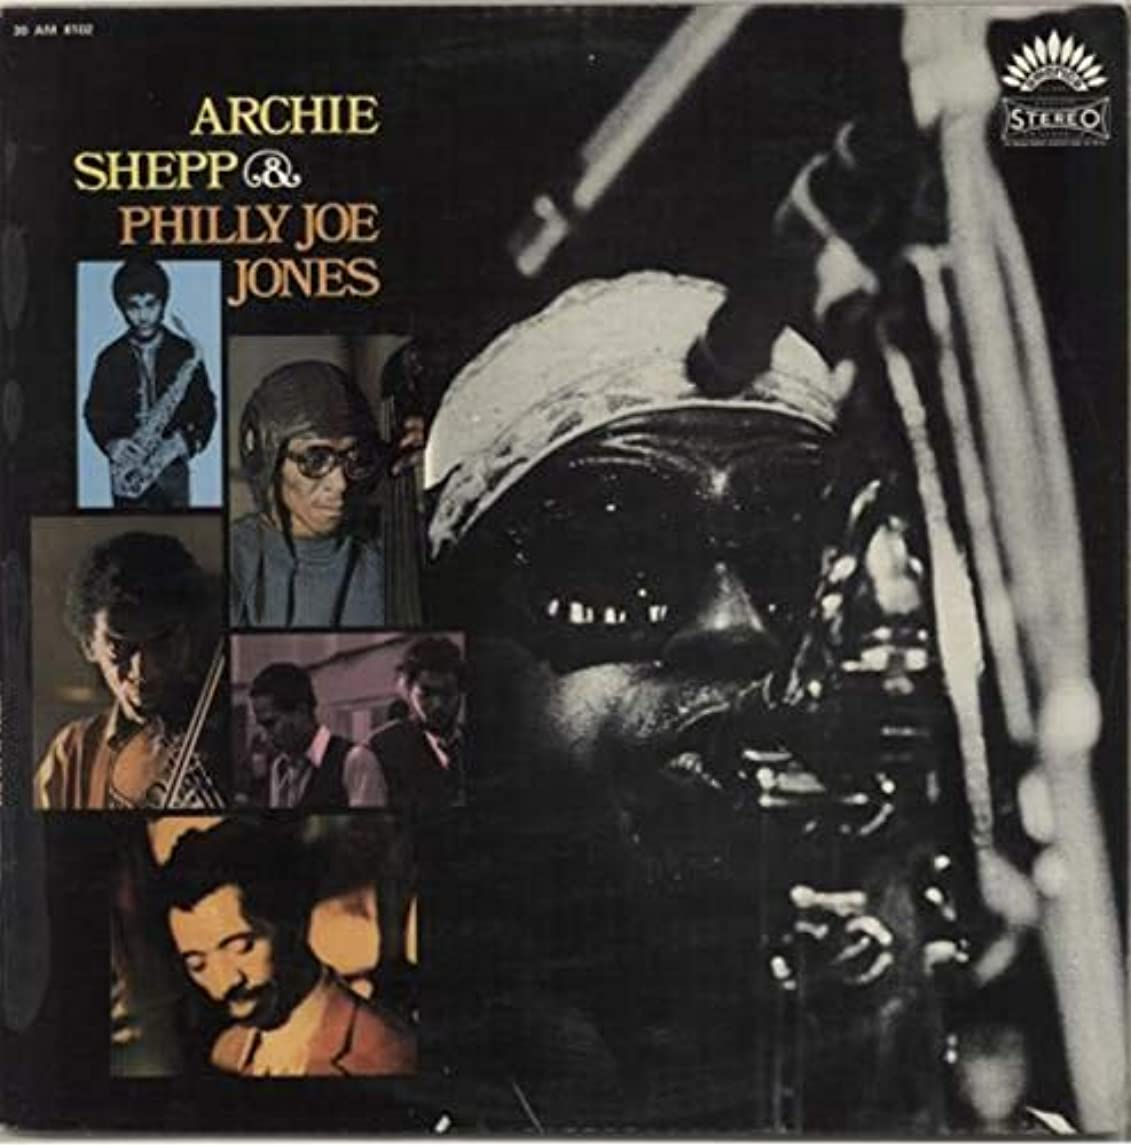 Archie Shepp & Philly Joe Jones